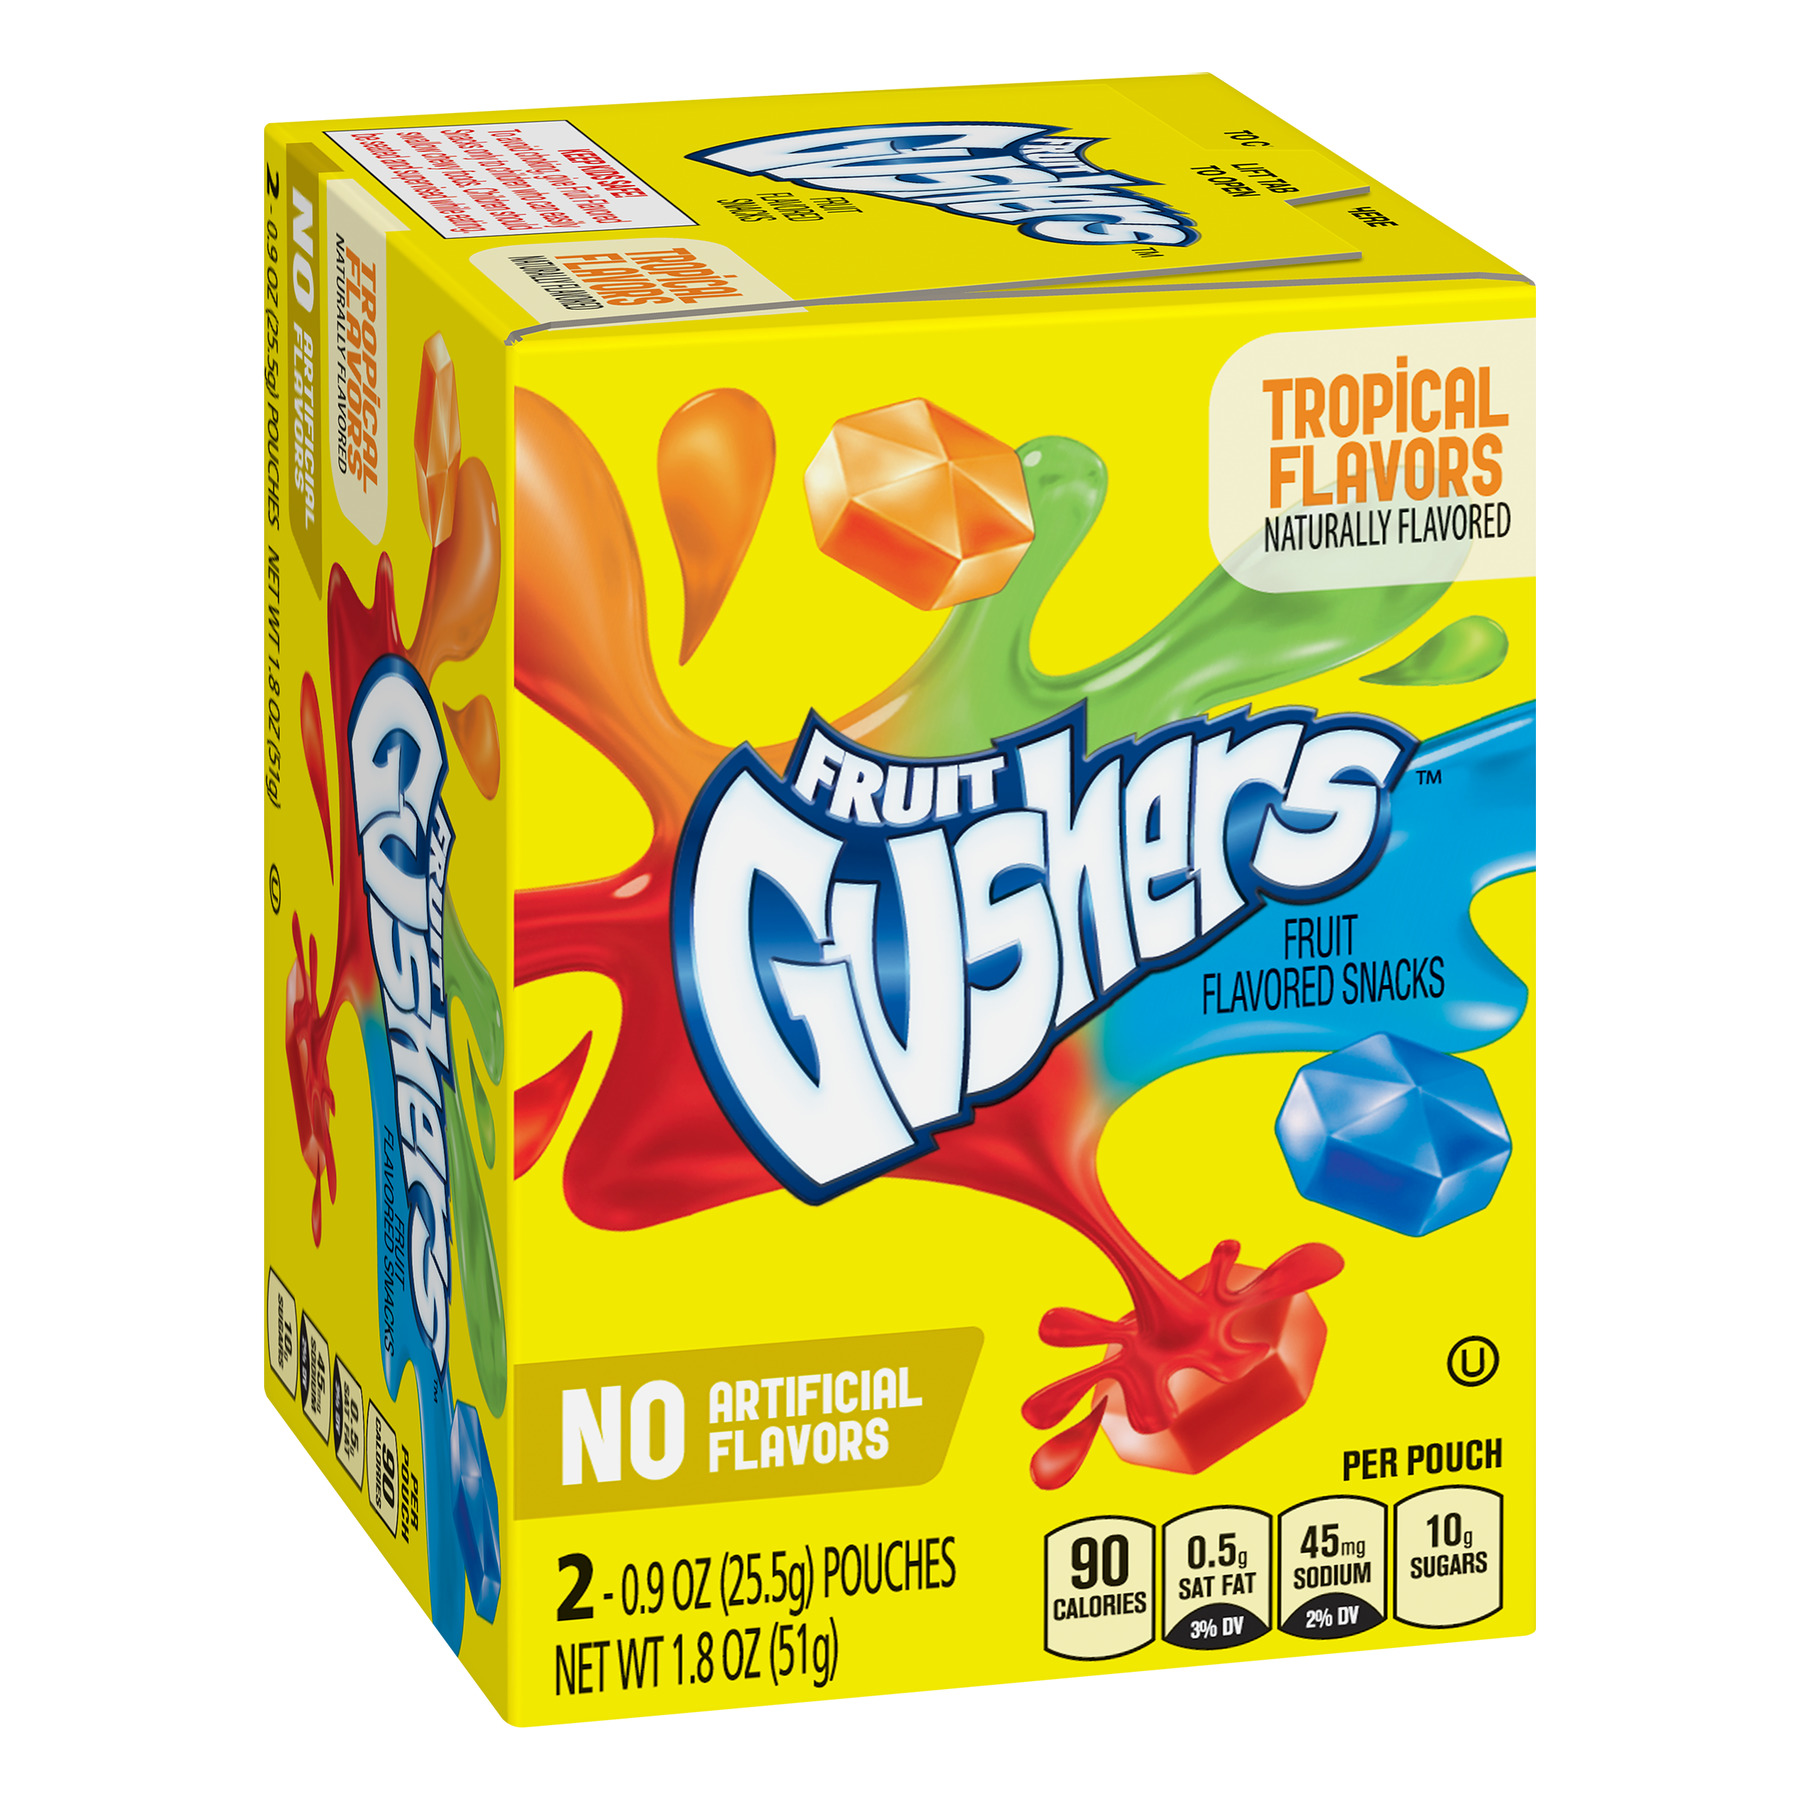 Betty Crocker® Fruit Gushers® Tropical Flavors Fruit Flavored Snacks